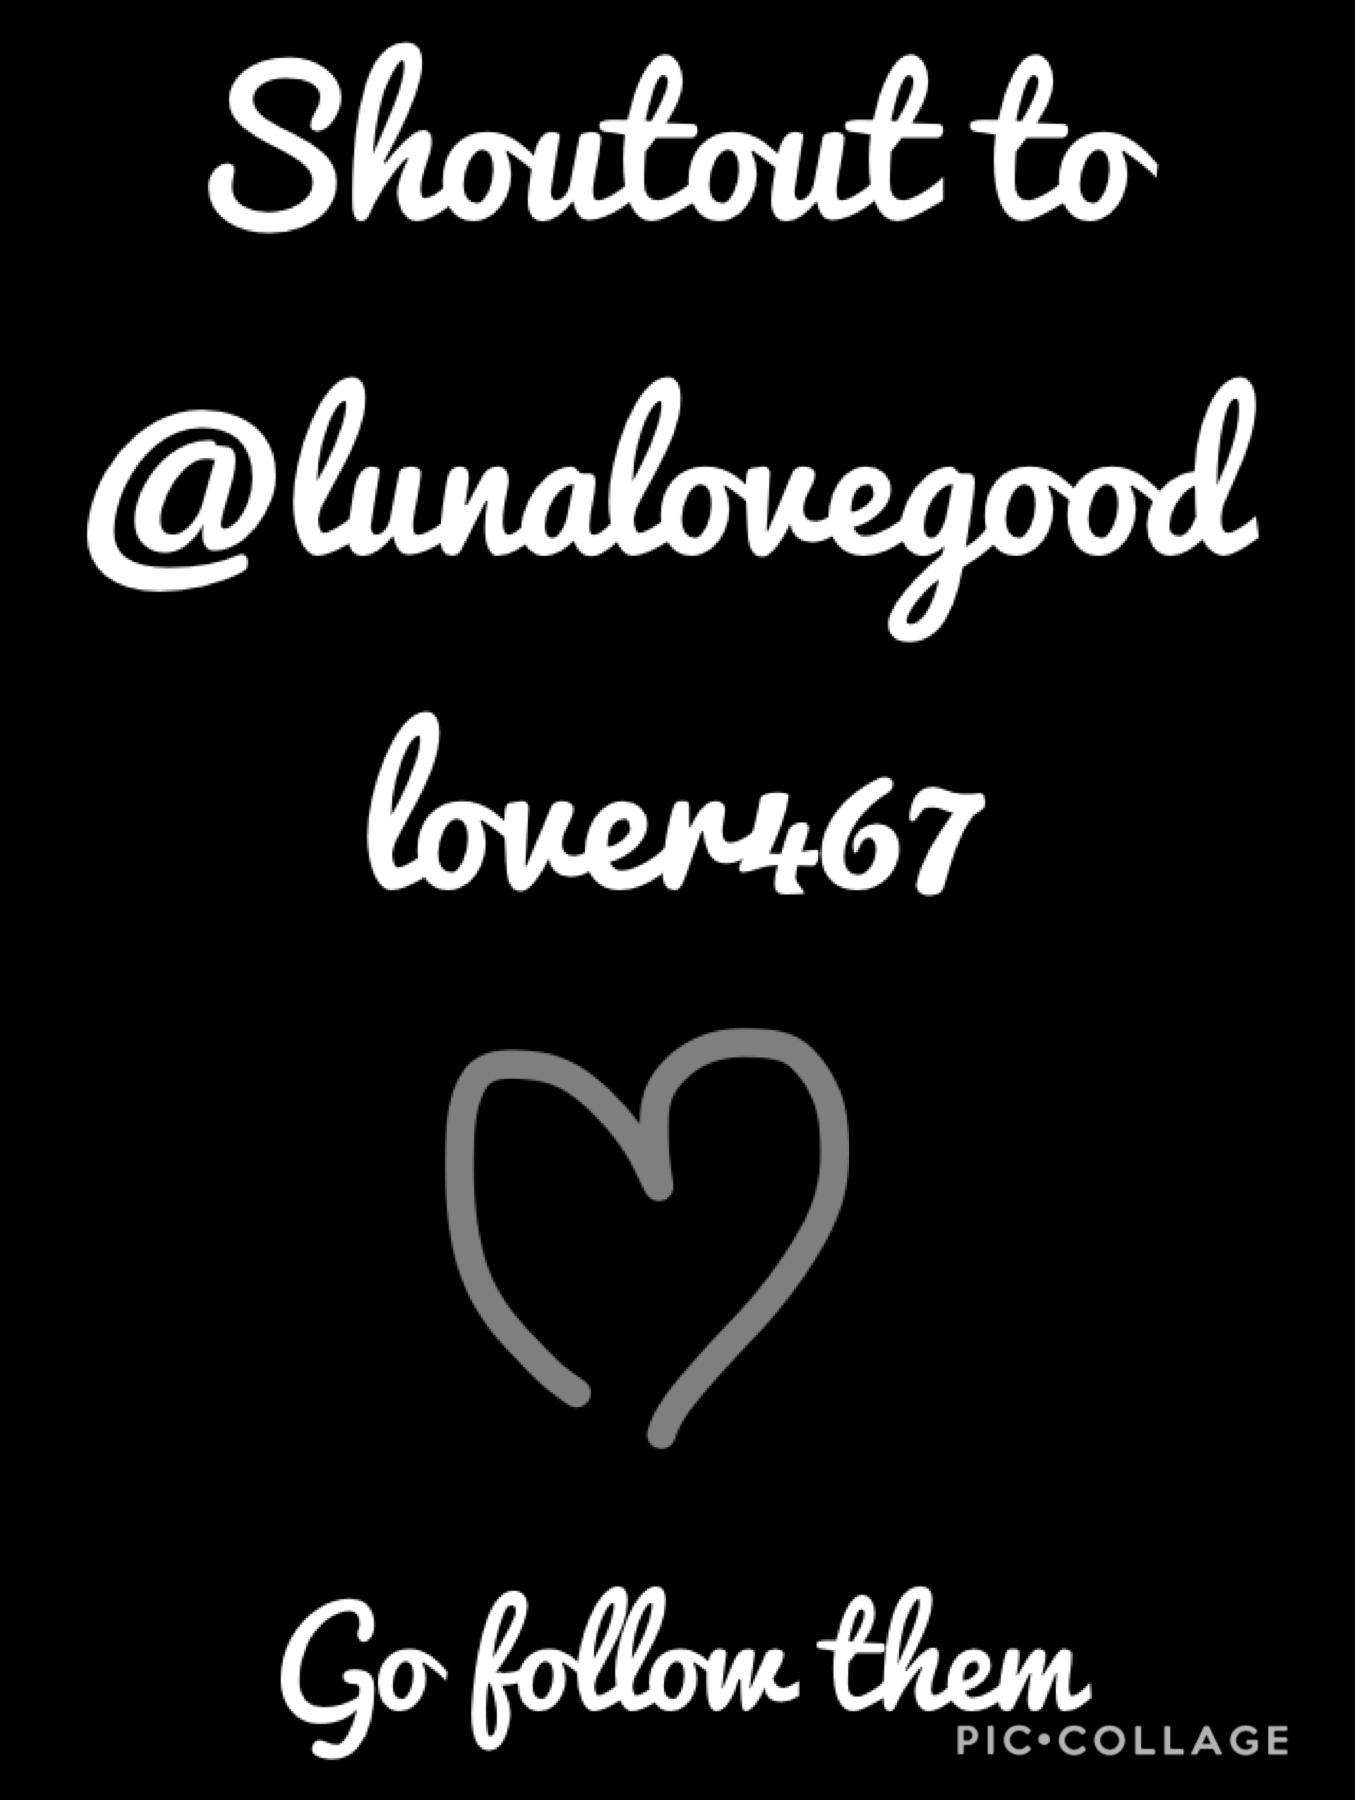 Follow them @lunalovegoodlover467